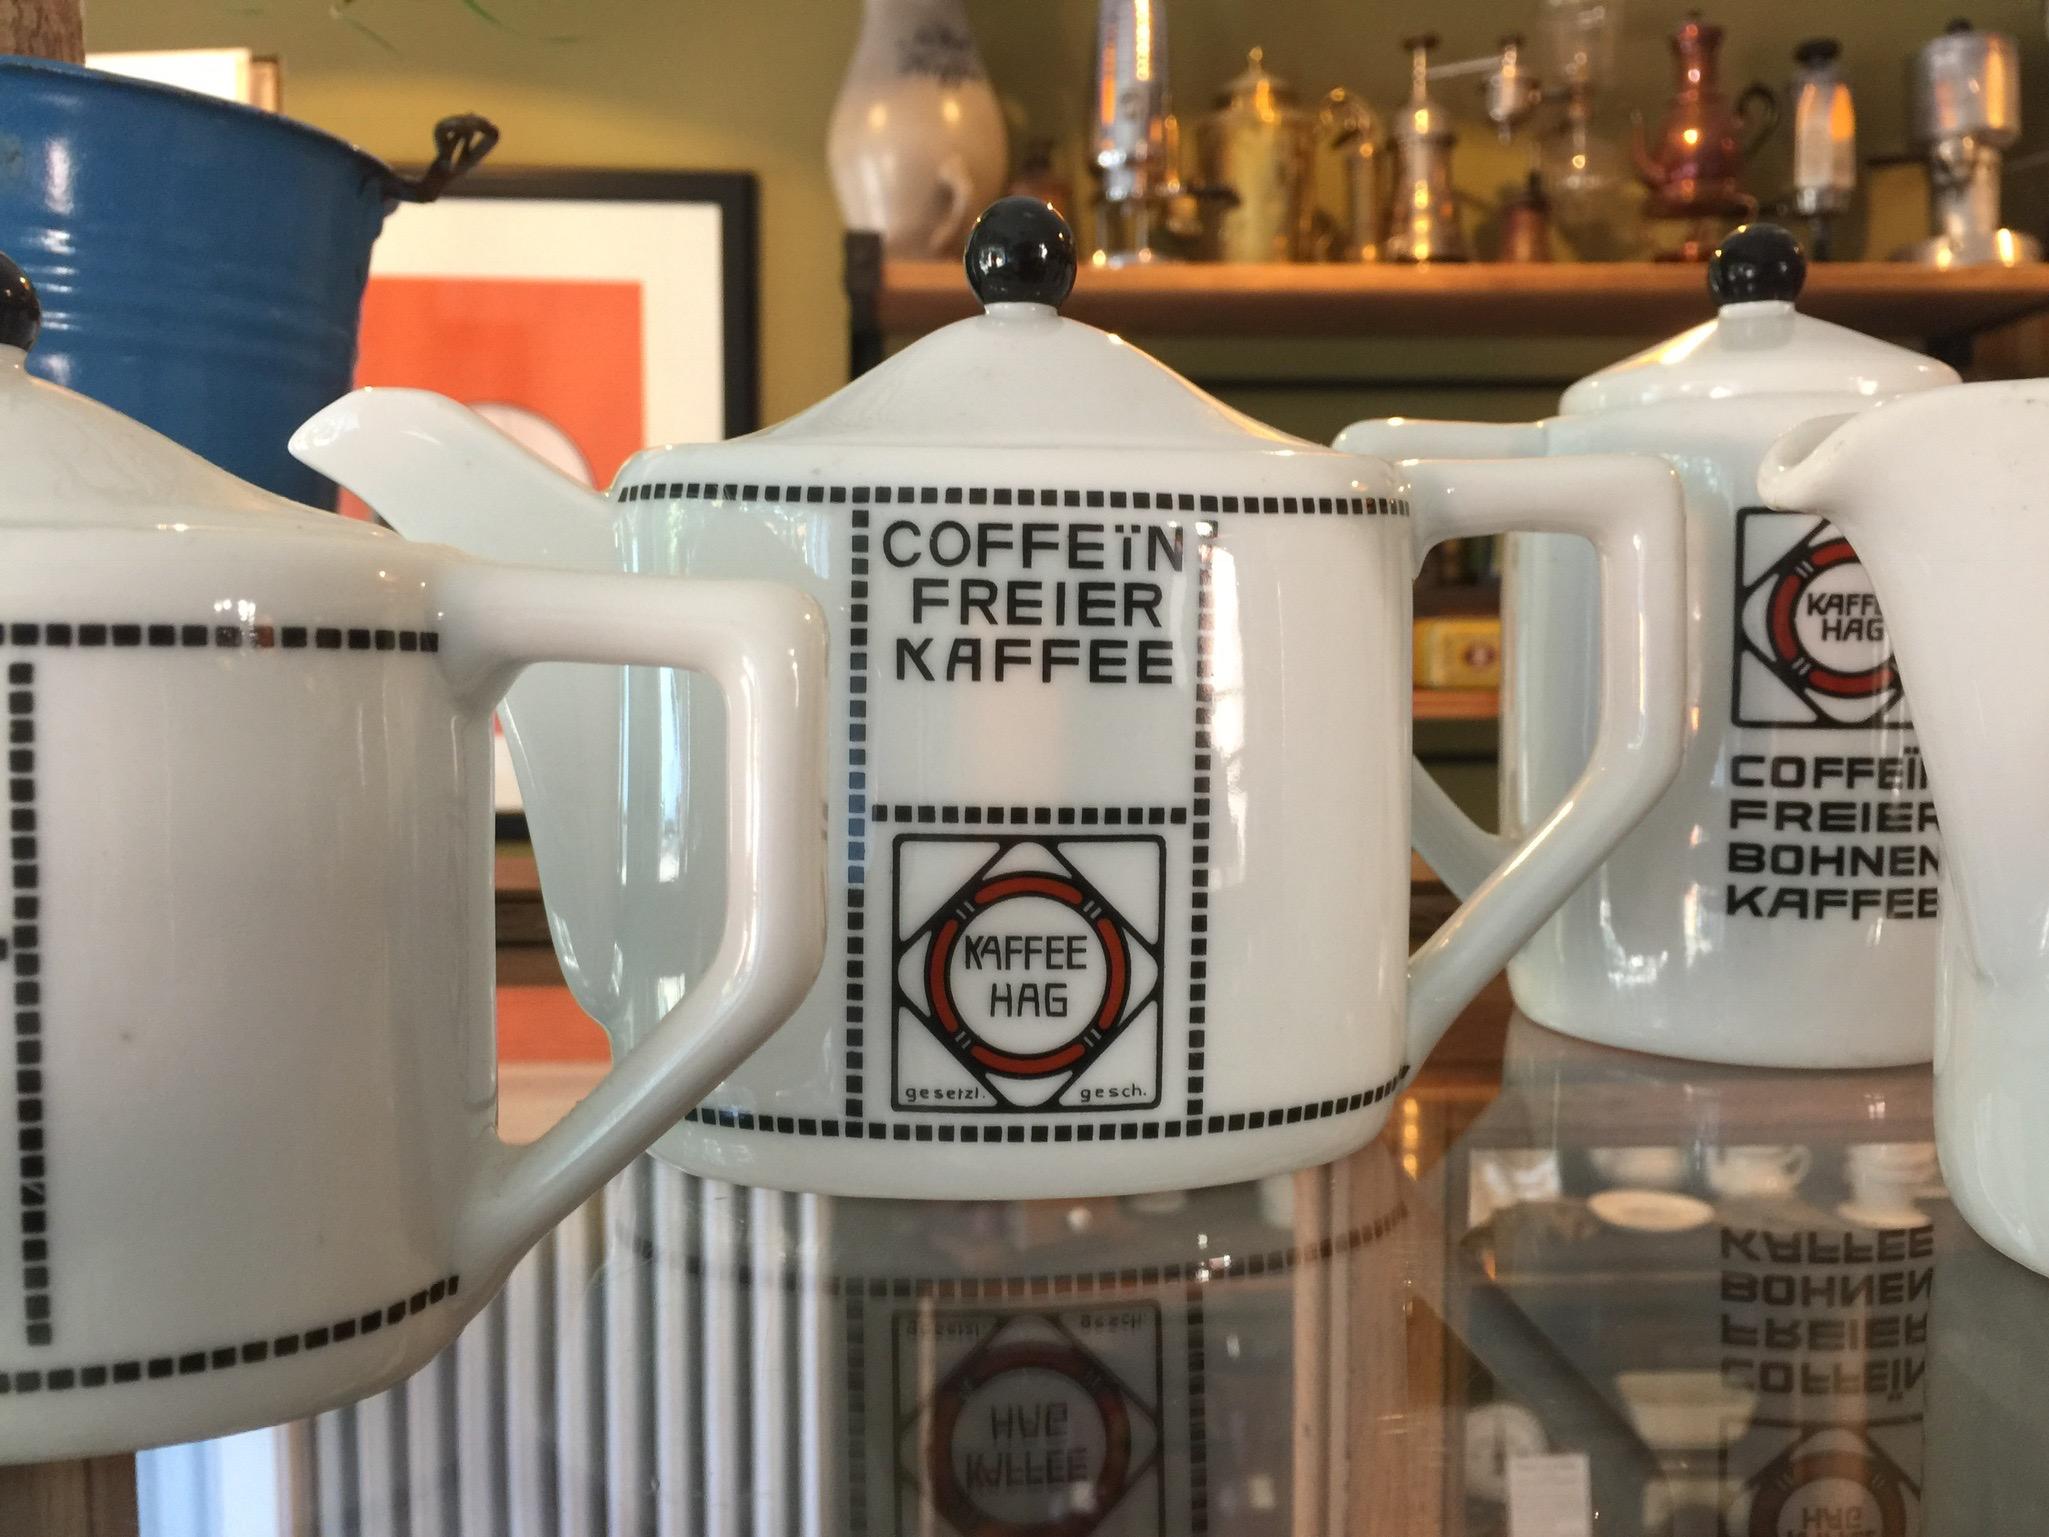 SAMPOR KAFFEE BERLIN Café Kaffeegeschäft in Heiligensee Reinickendorf